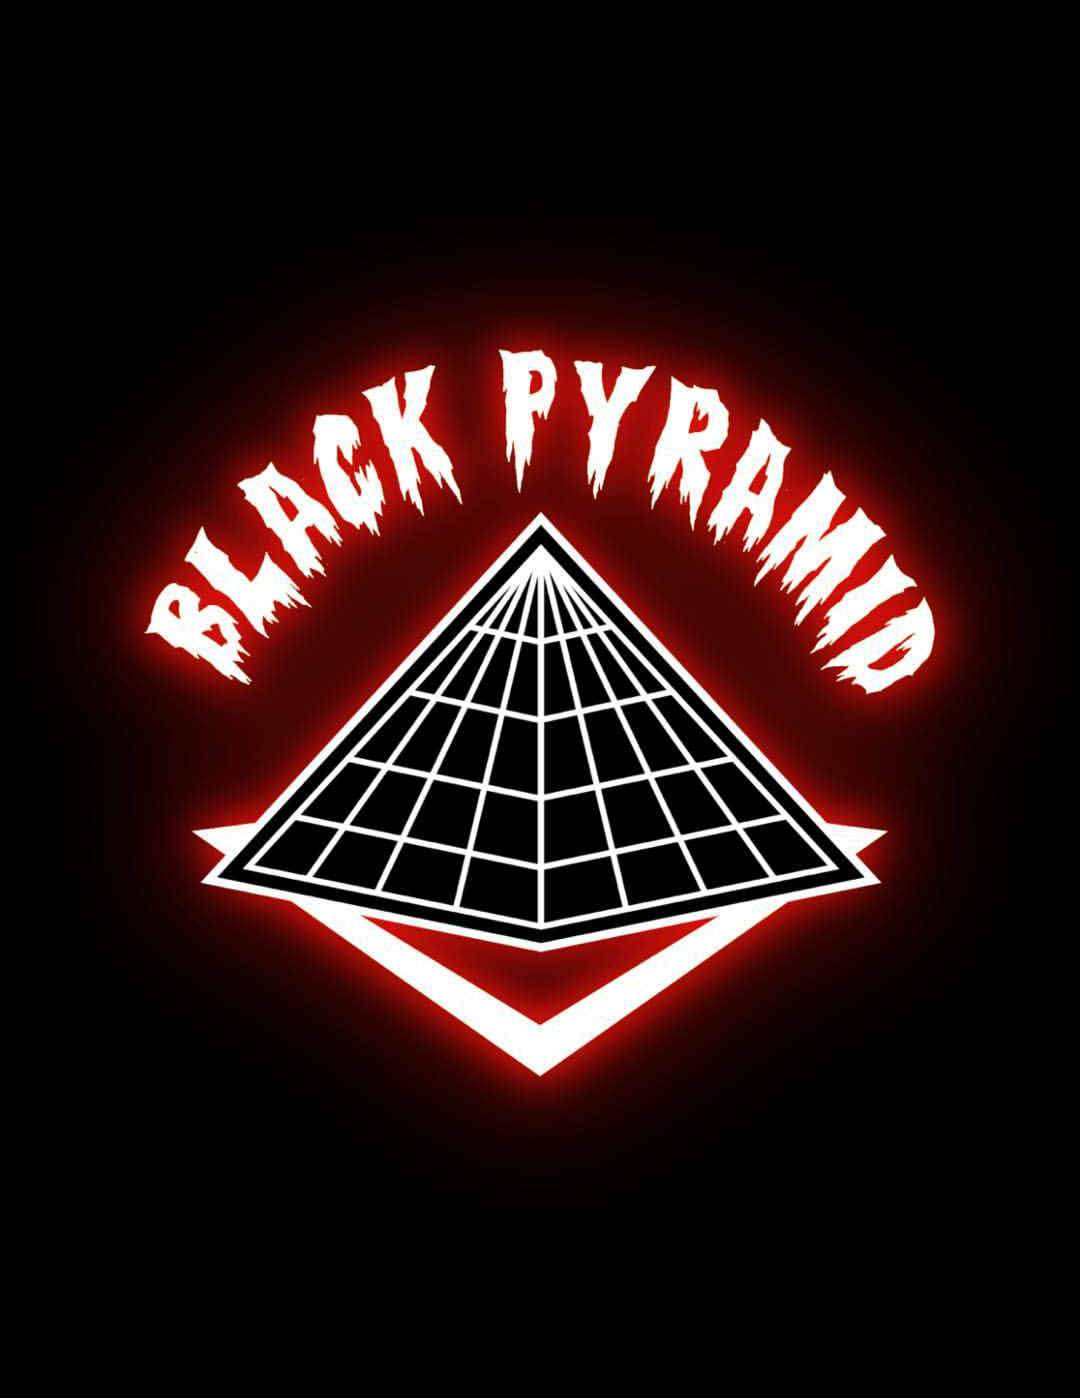 20] Black Pyramid Wallpapers on WallpaperSafari 1080x1398